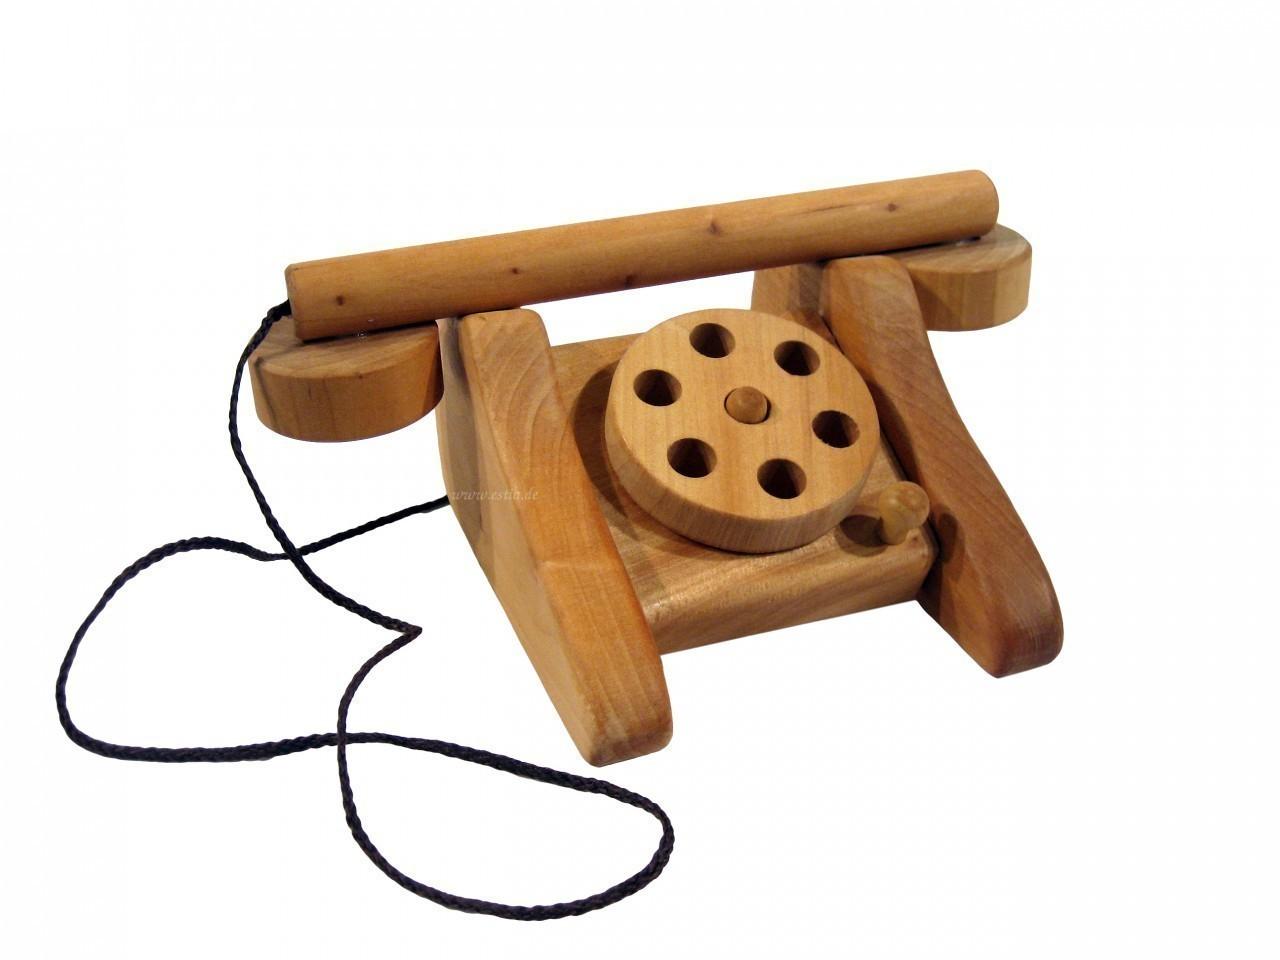 nostalgisches telefon mit w hlscheibe aus hartholz farbe holzfarbend ge lt ma e 17 x 17 x. Black Bedroom Furniture Sets. Home Design Ideas